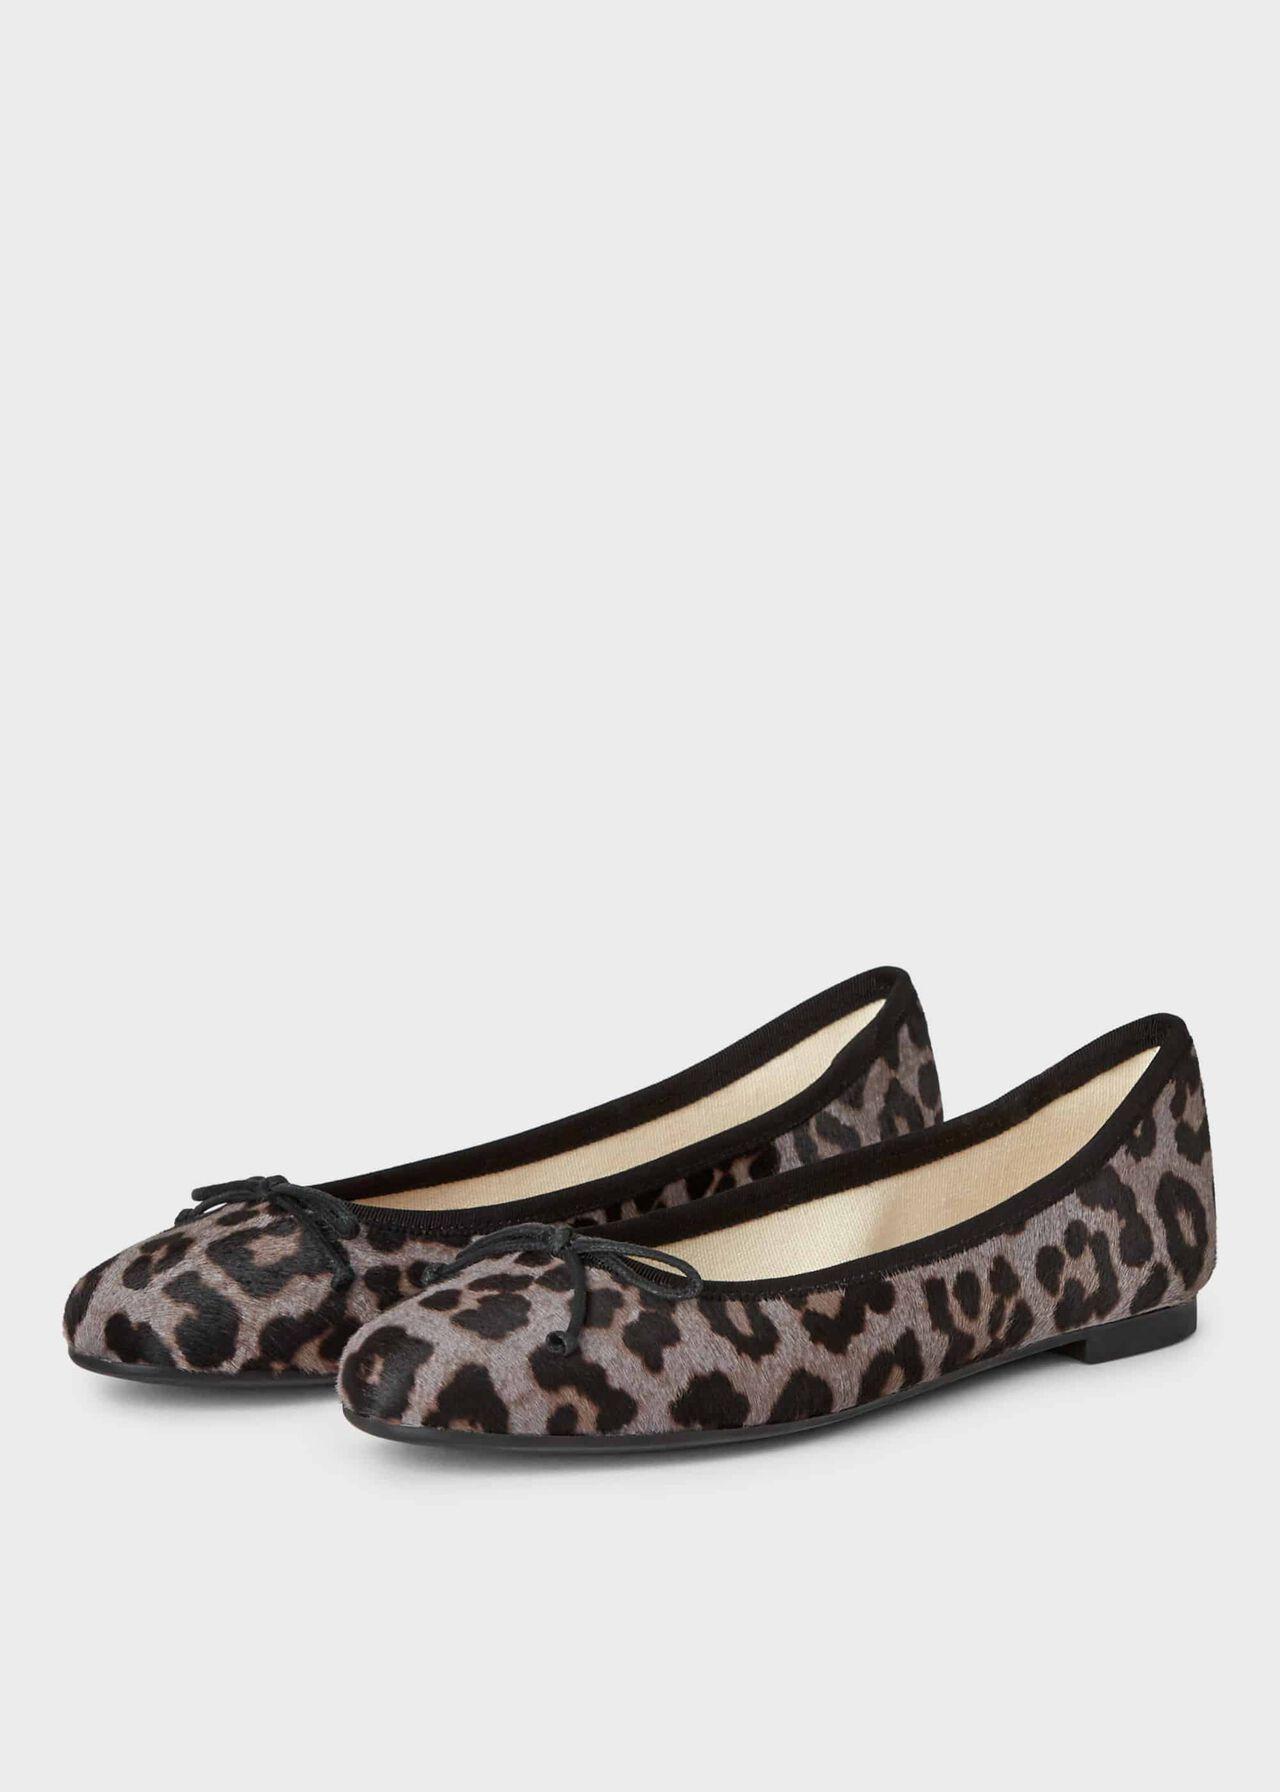 Flo Ballerina Grey Leopard